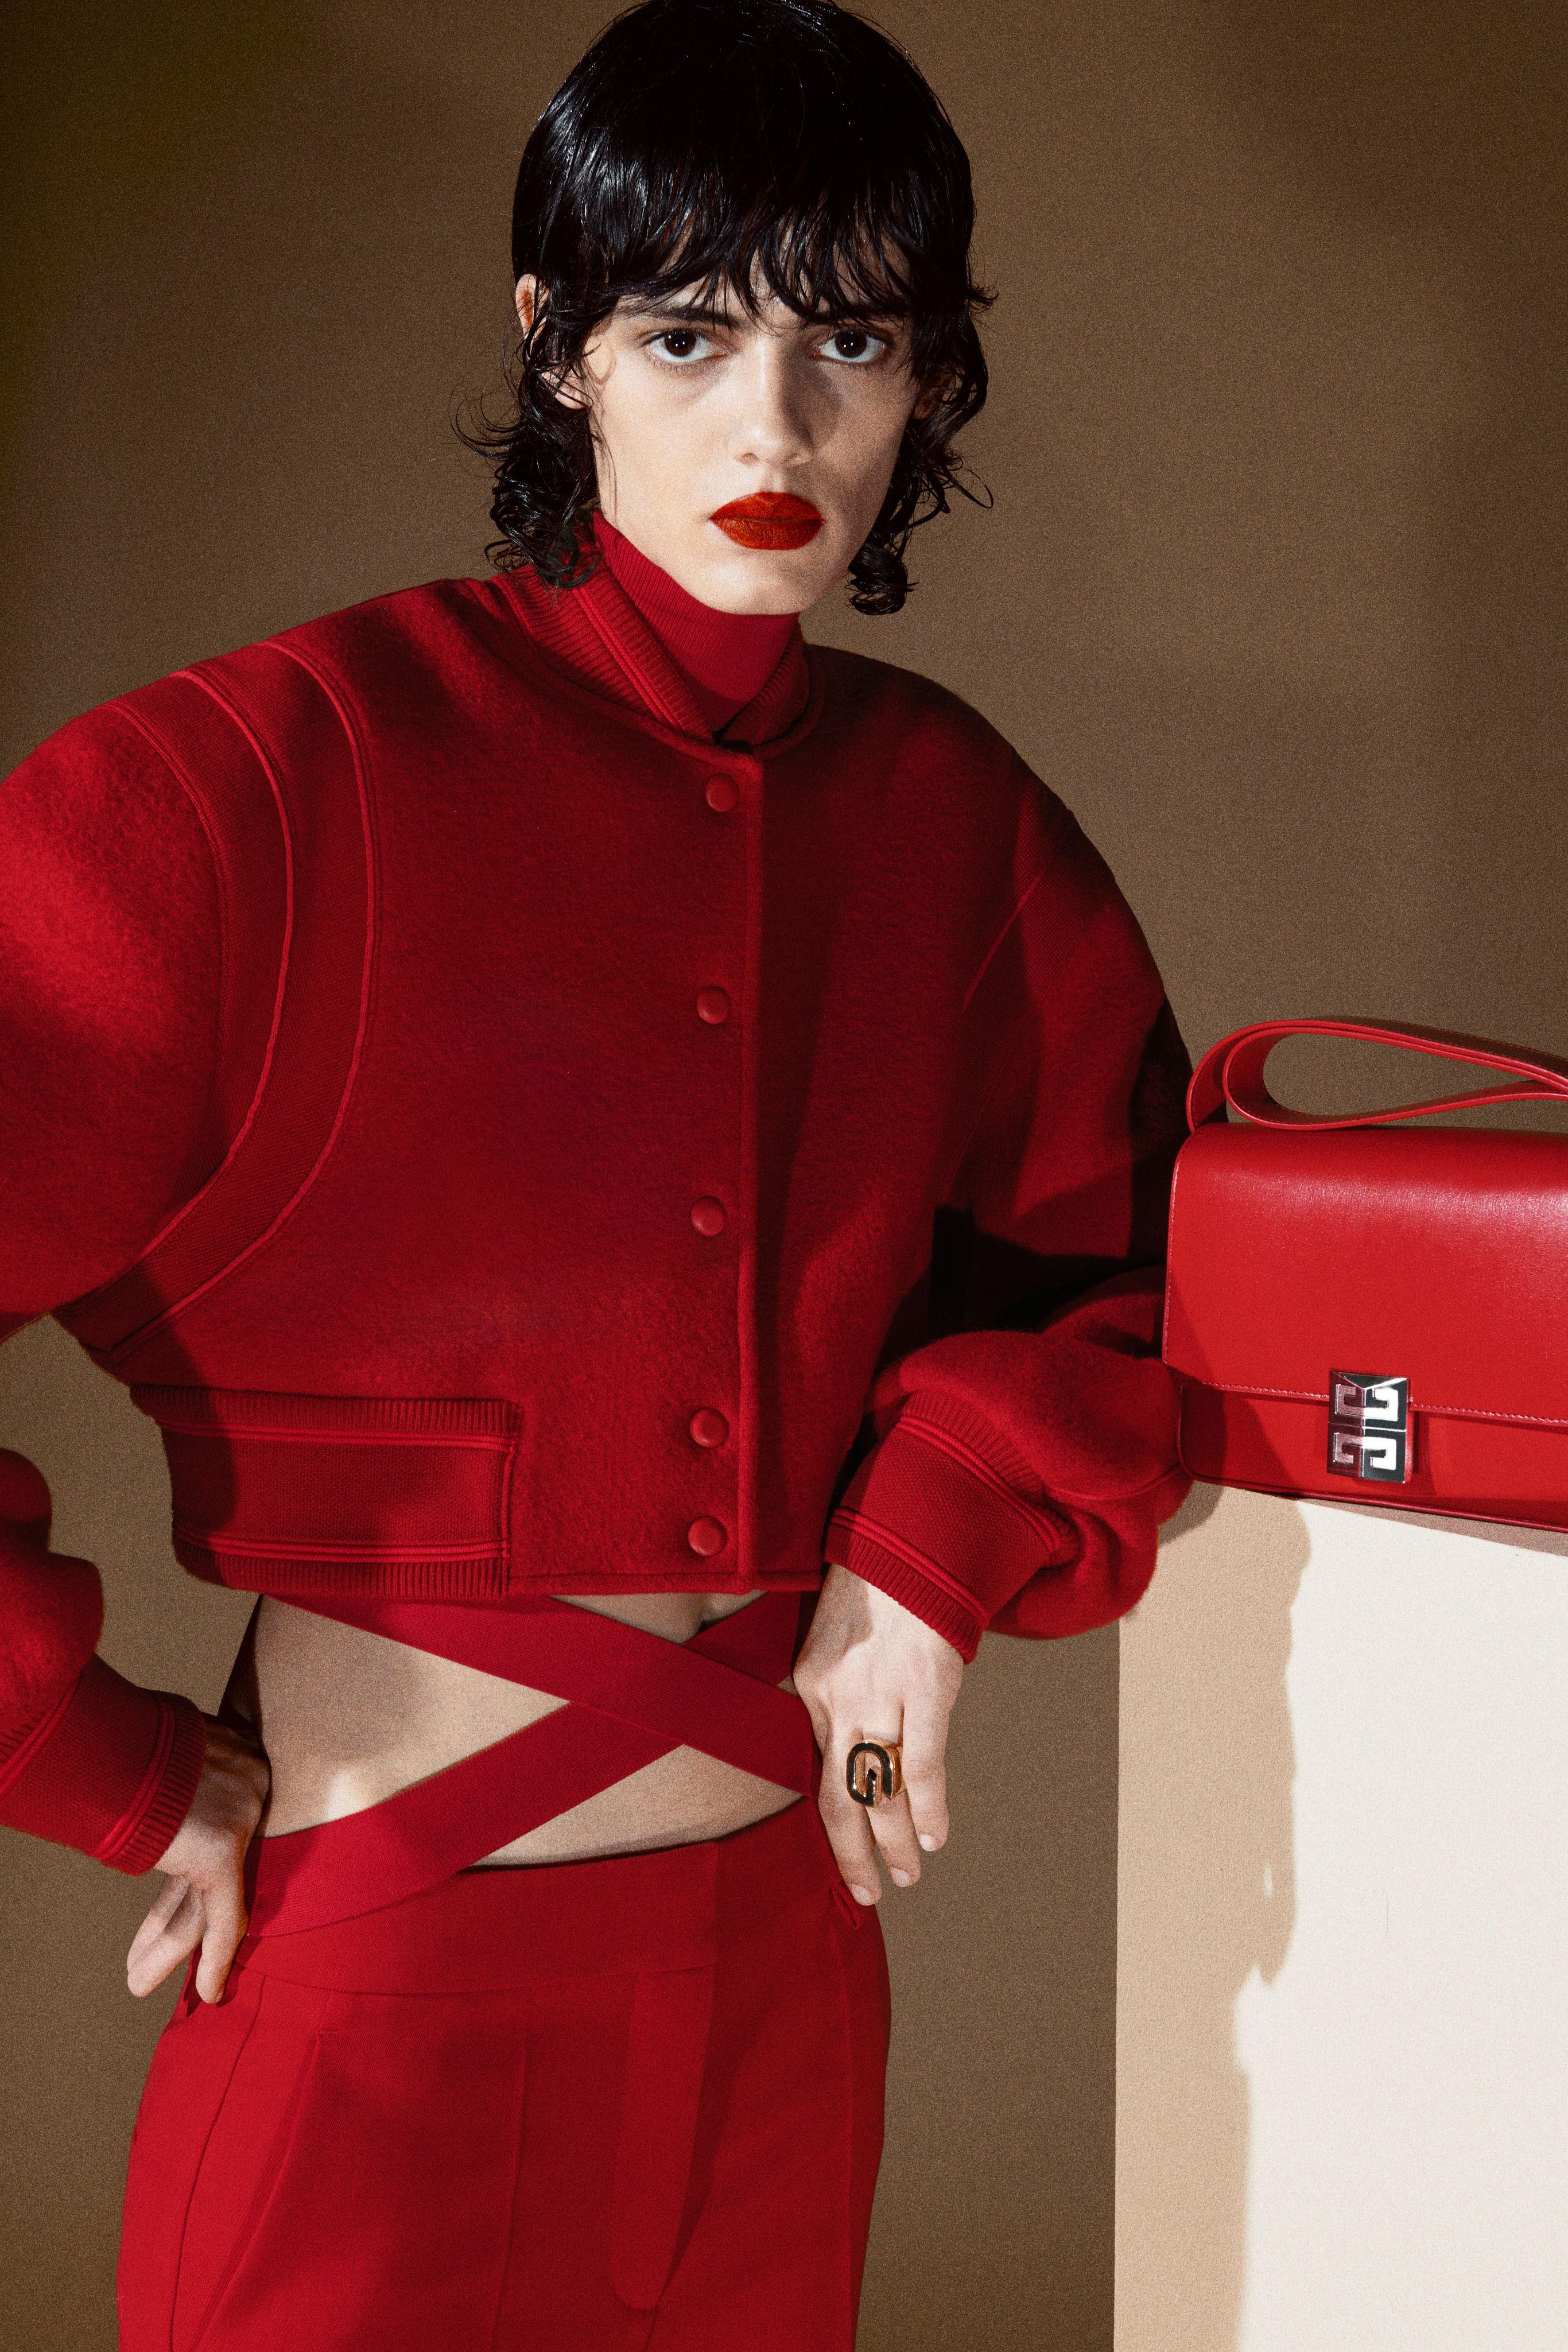 00011-Givenchy-Pre-Fall-21